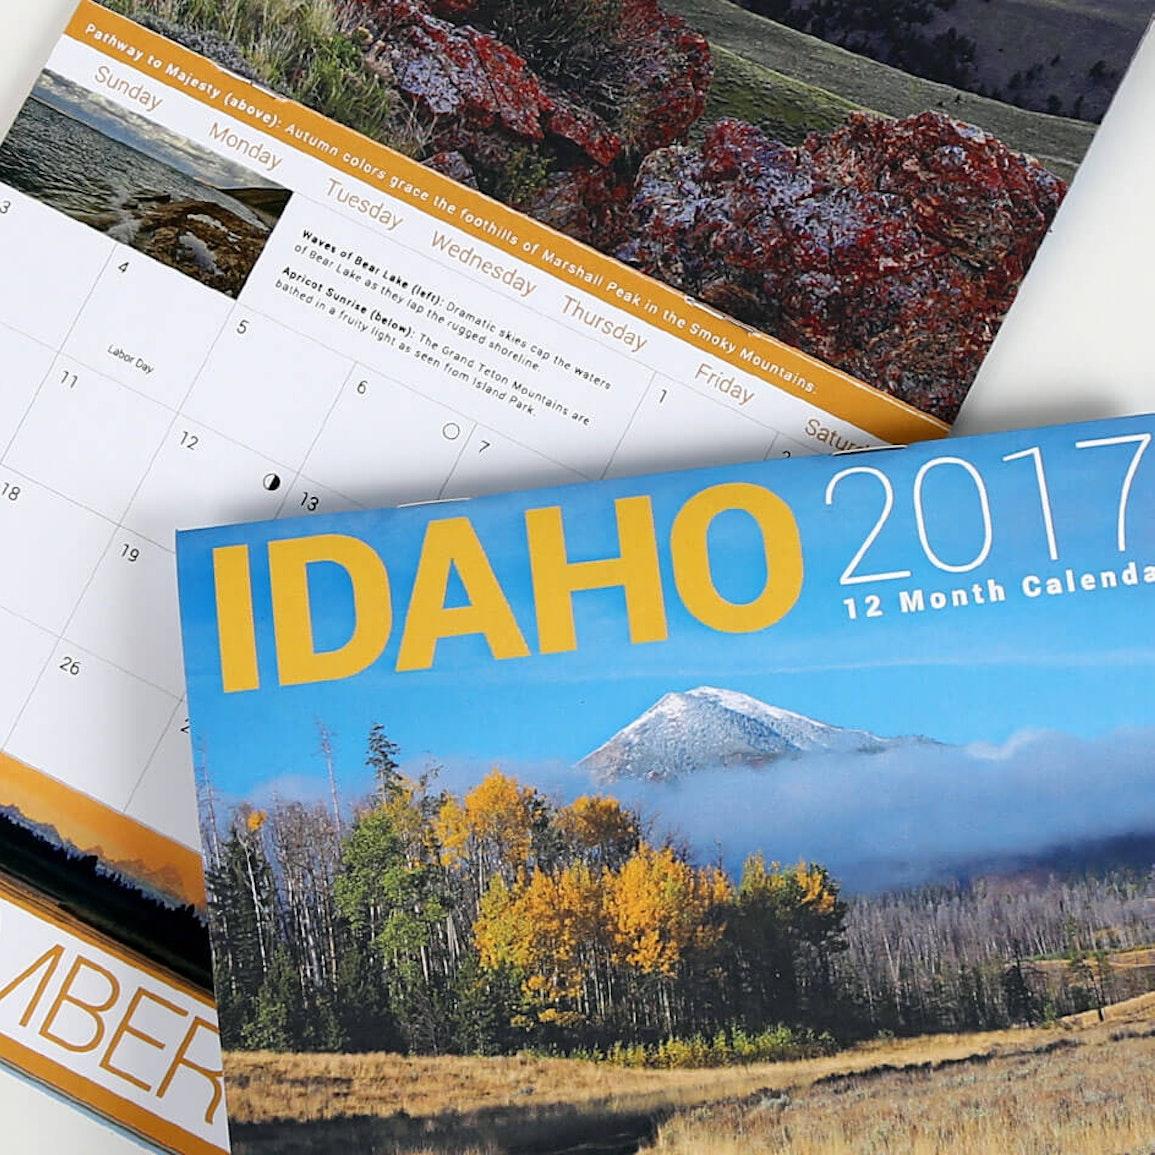 category-calendars-project-spotlight-drawer-background-image-2018070501.jpg